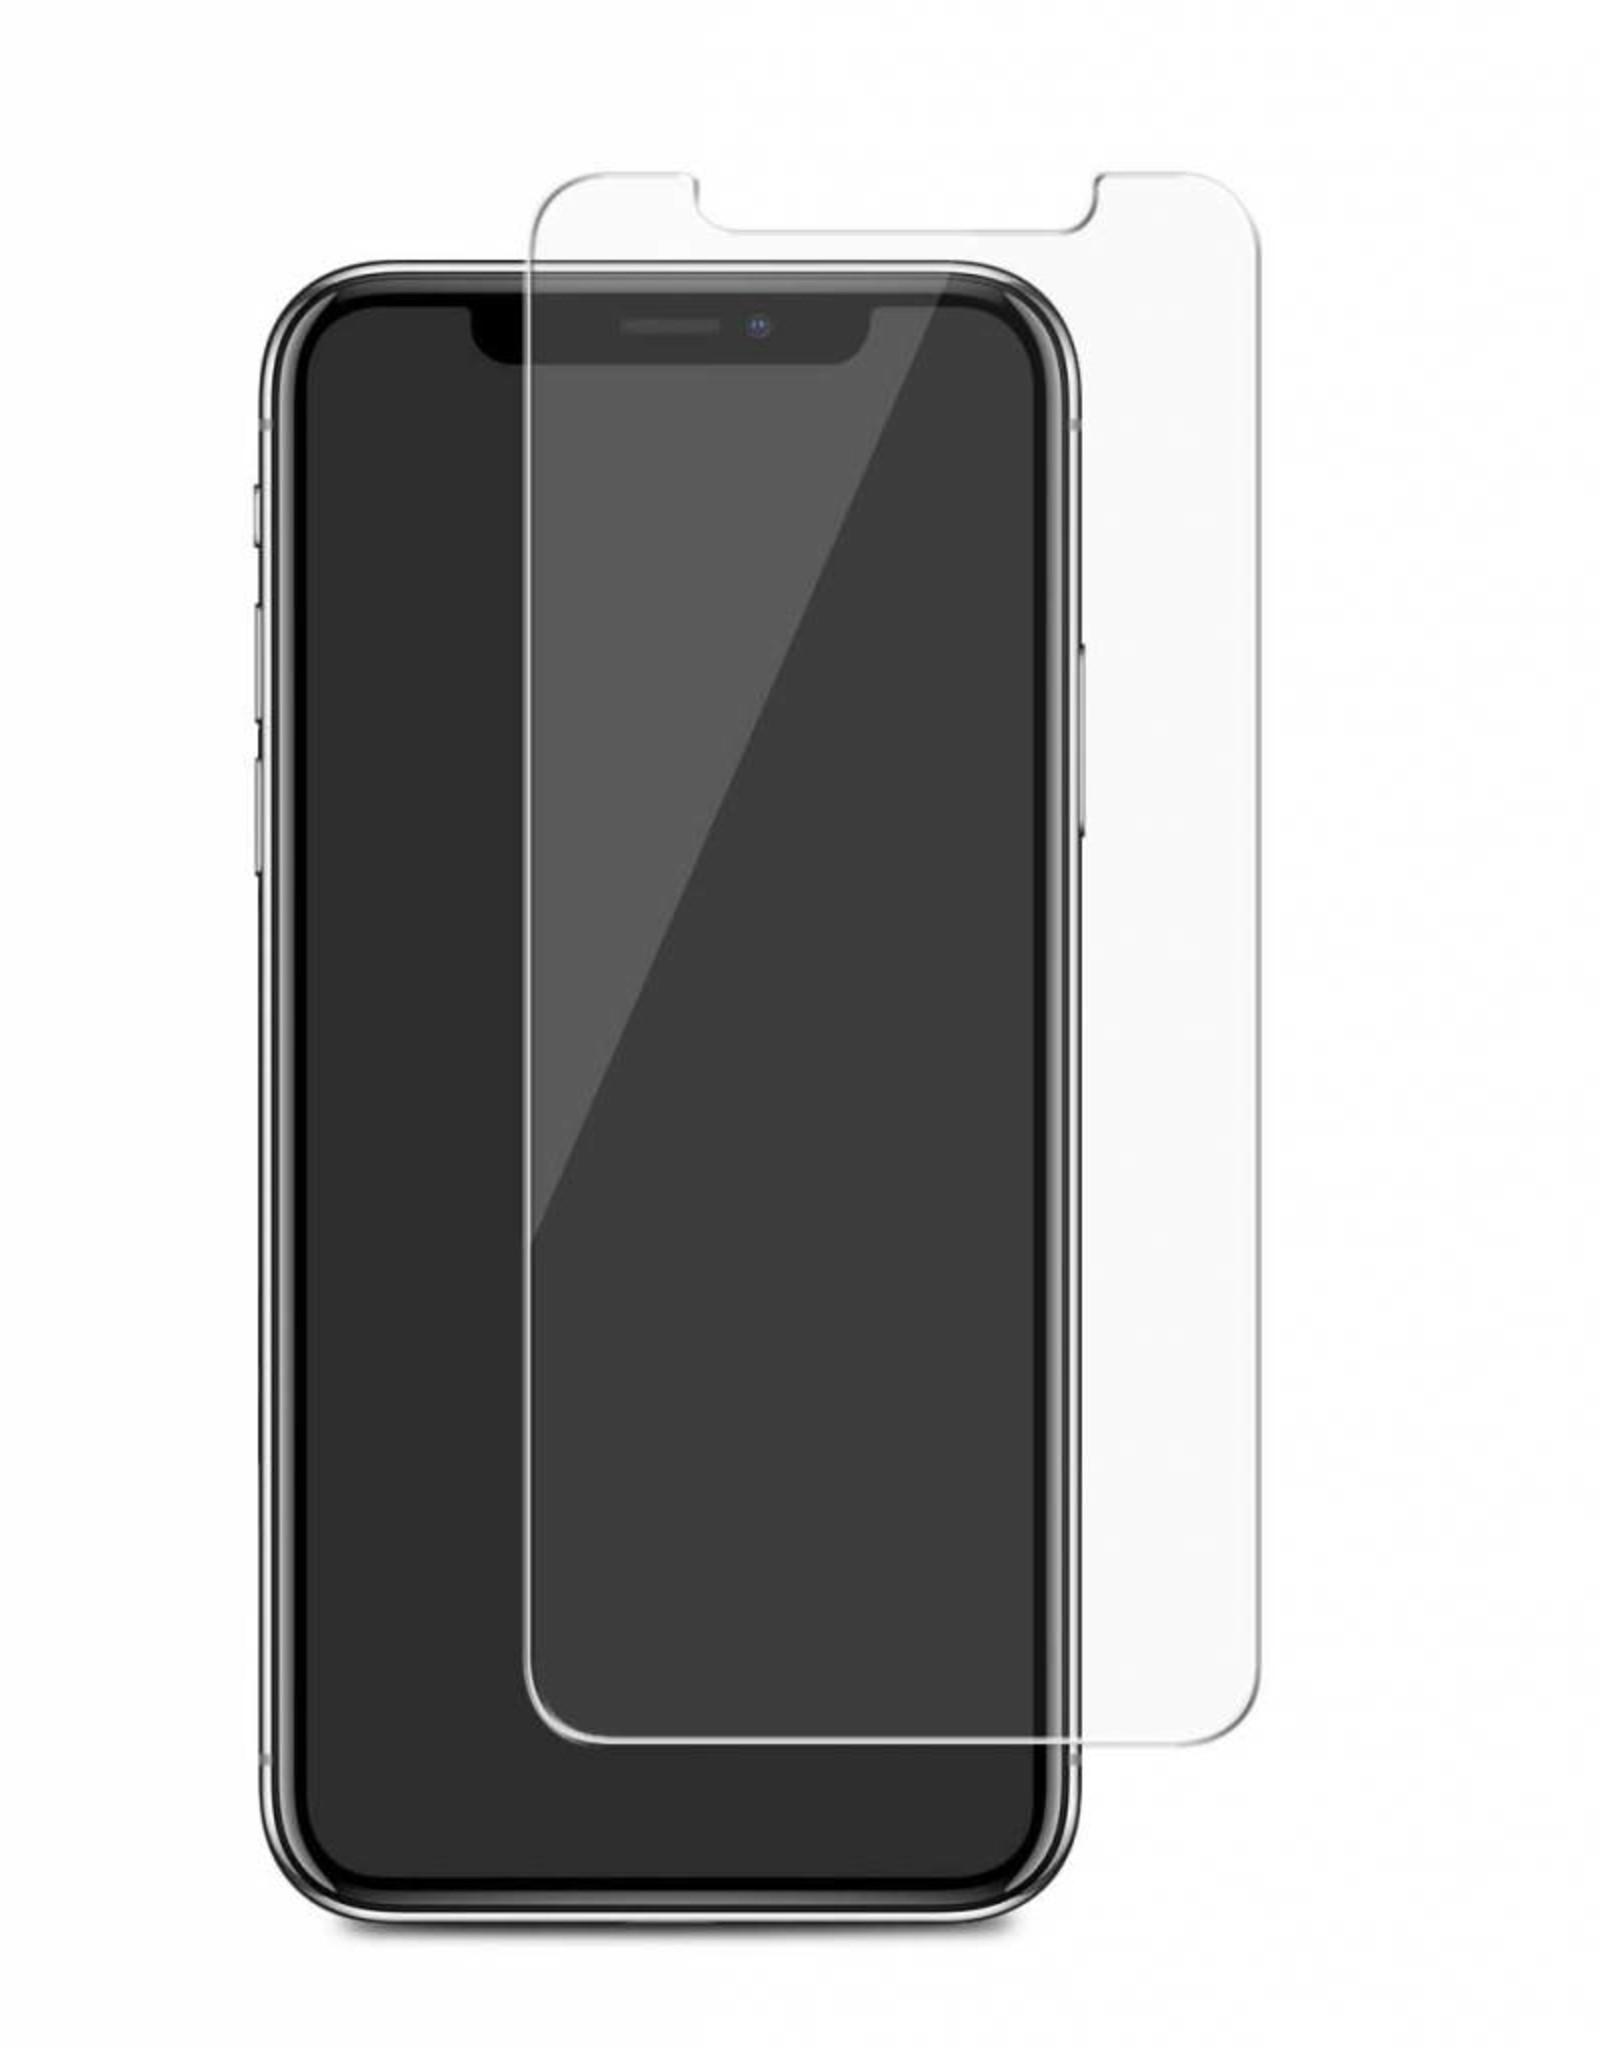 Blu Element /// Blu Element | iPhone Xs Max Tempered Glass Screen Protector | 118-2035